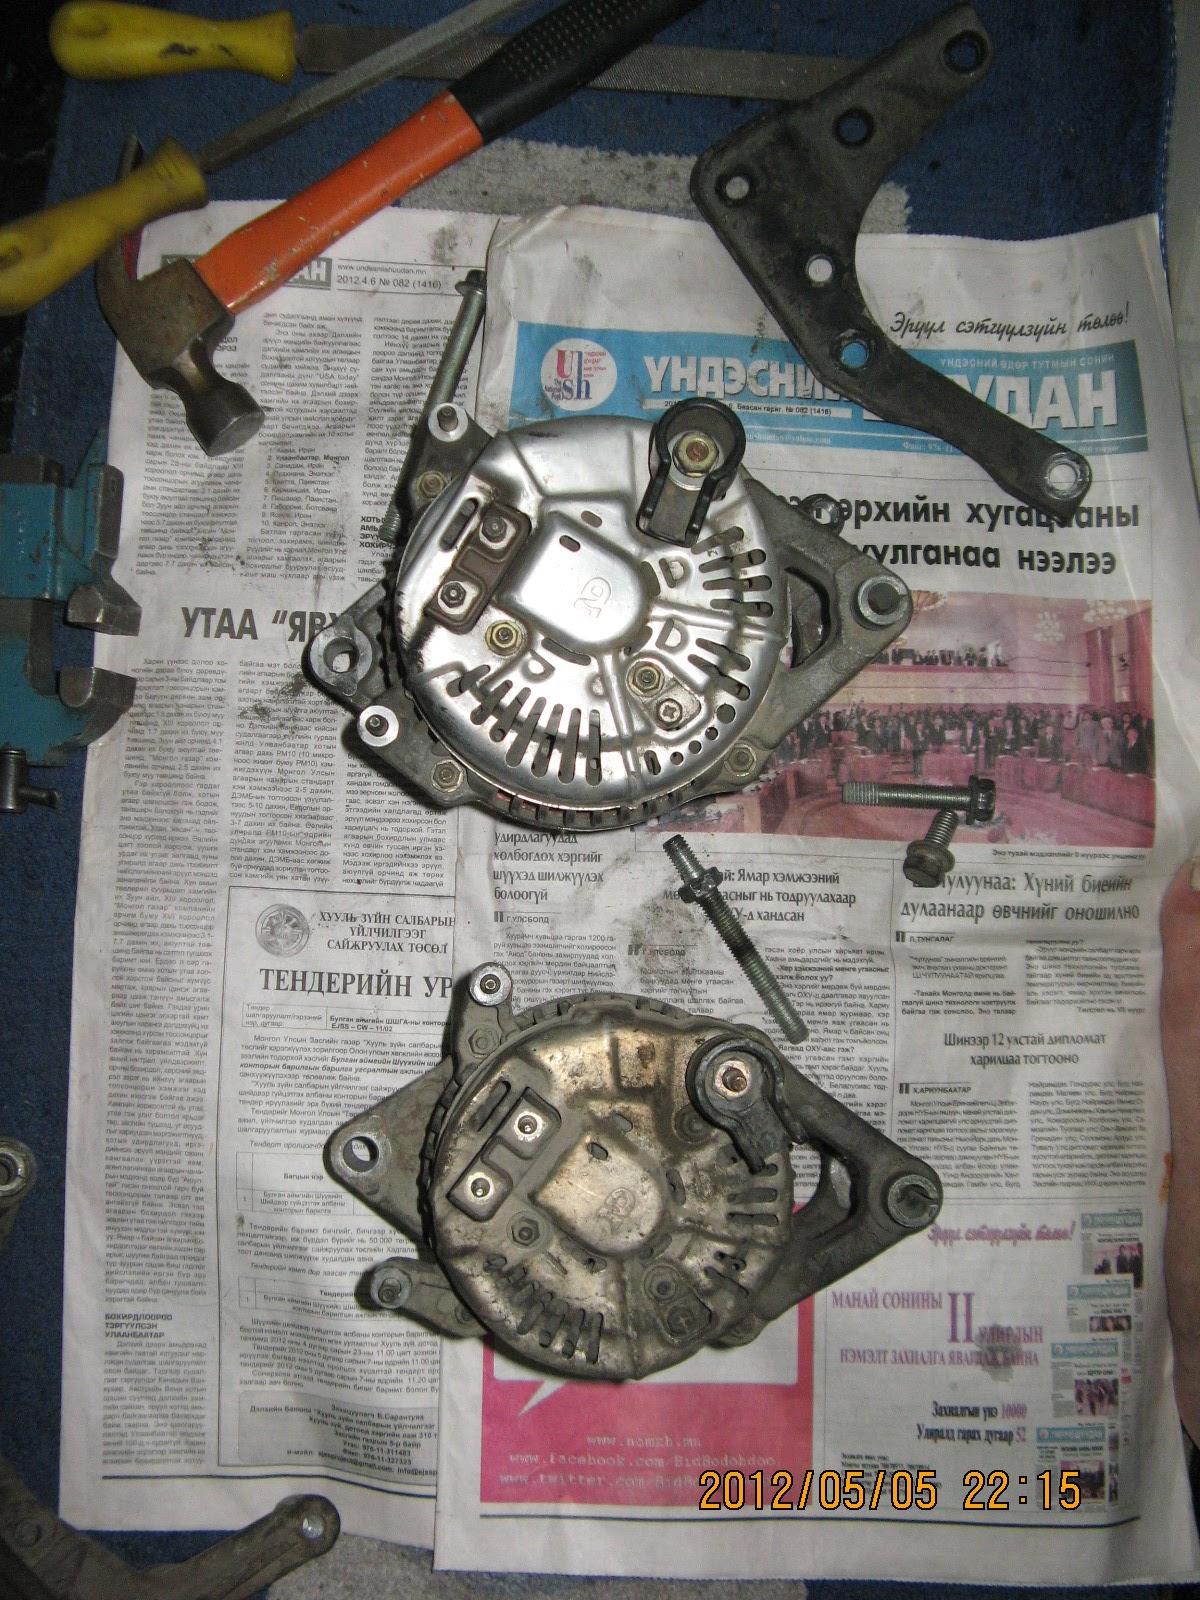 91 jeep cherokee alternator wiring diagram genteq motor my 3991 xj upgrade 136a